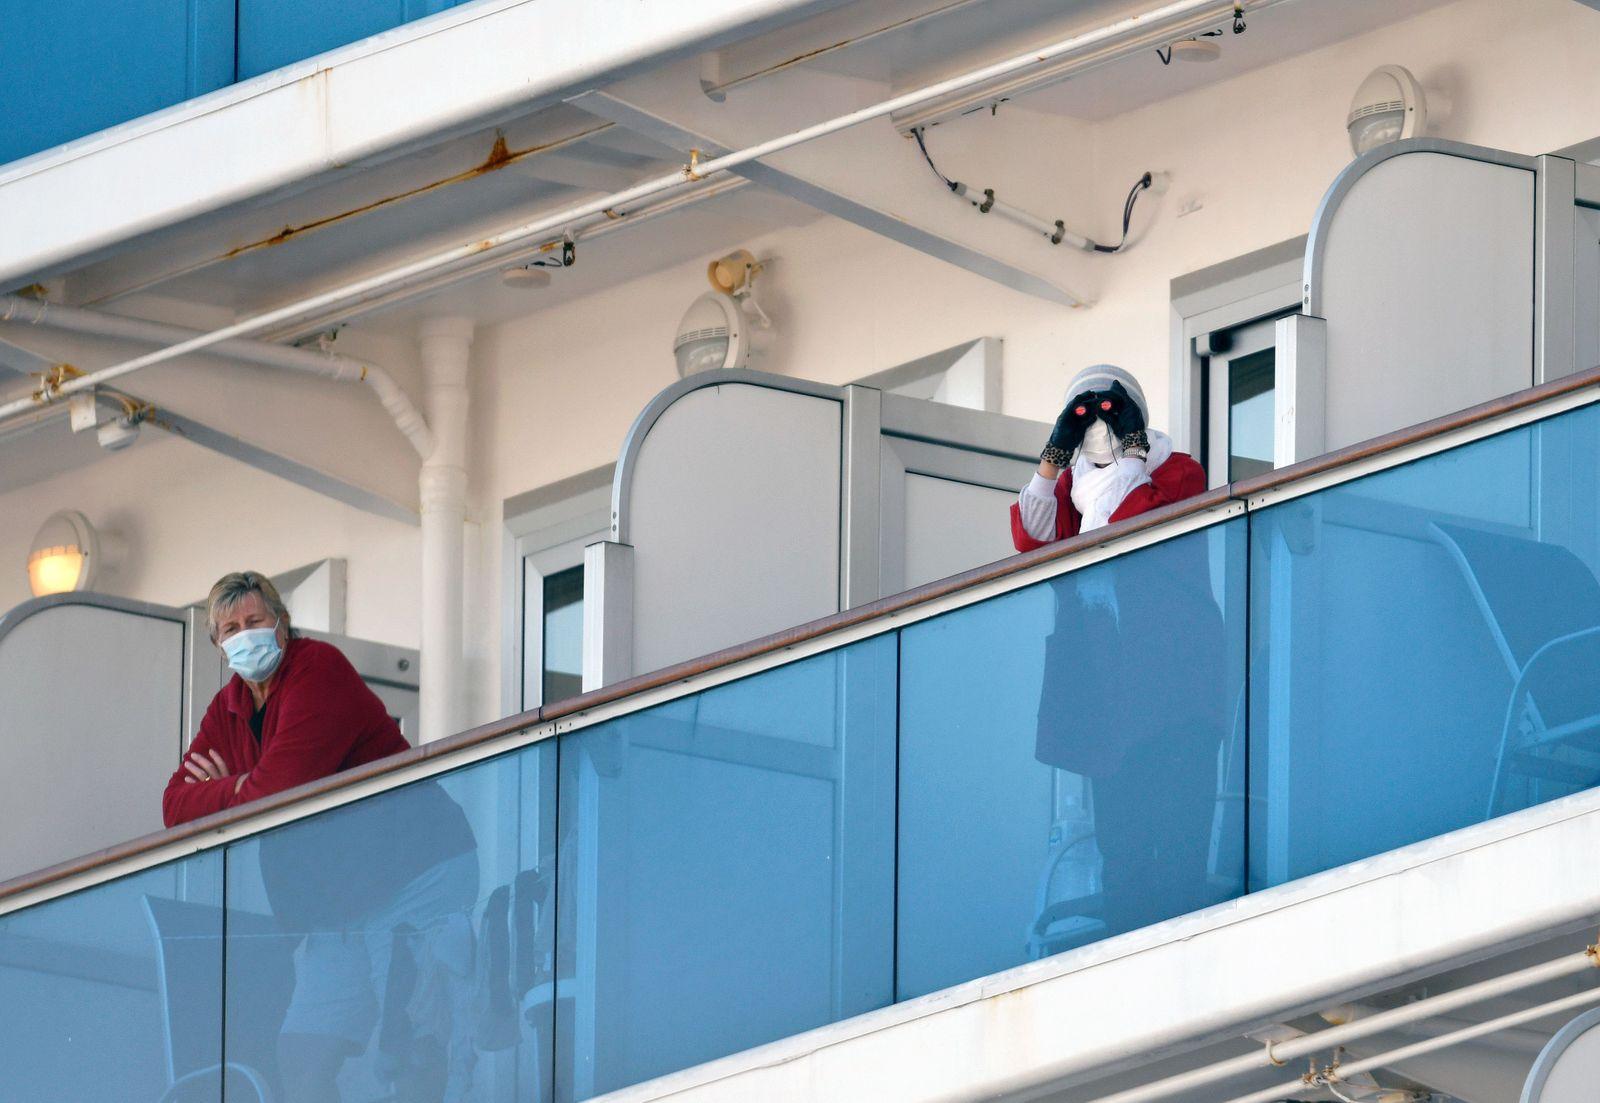 Cruise ship passengers infected with novel coronavirus in Japan, Yokohama - 11 Feb 2020